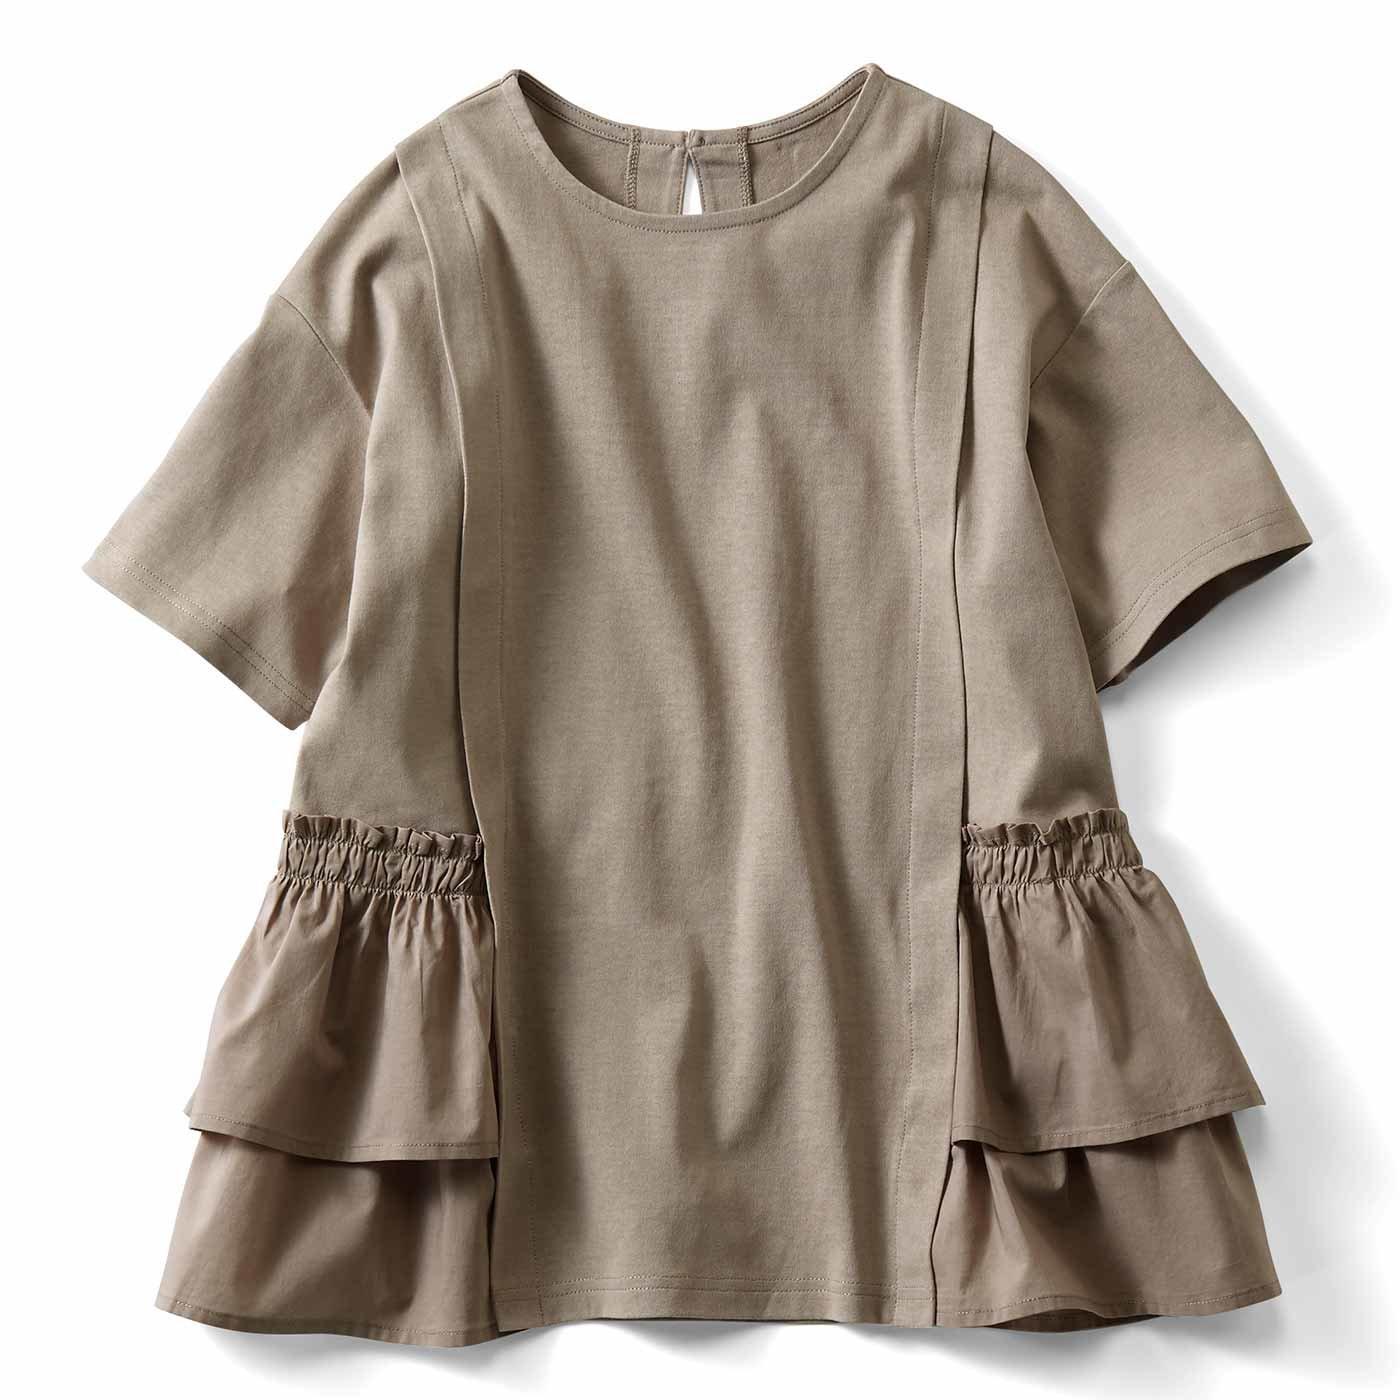 IEDIT[イディット] 汗じみ軽減加工をほどこした異素材遣いTシャツ〈ベージュ〉